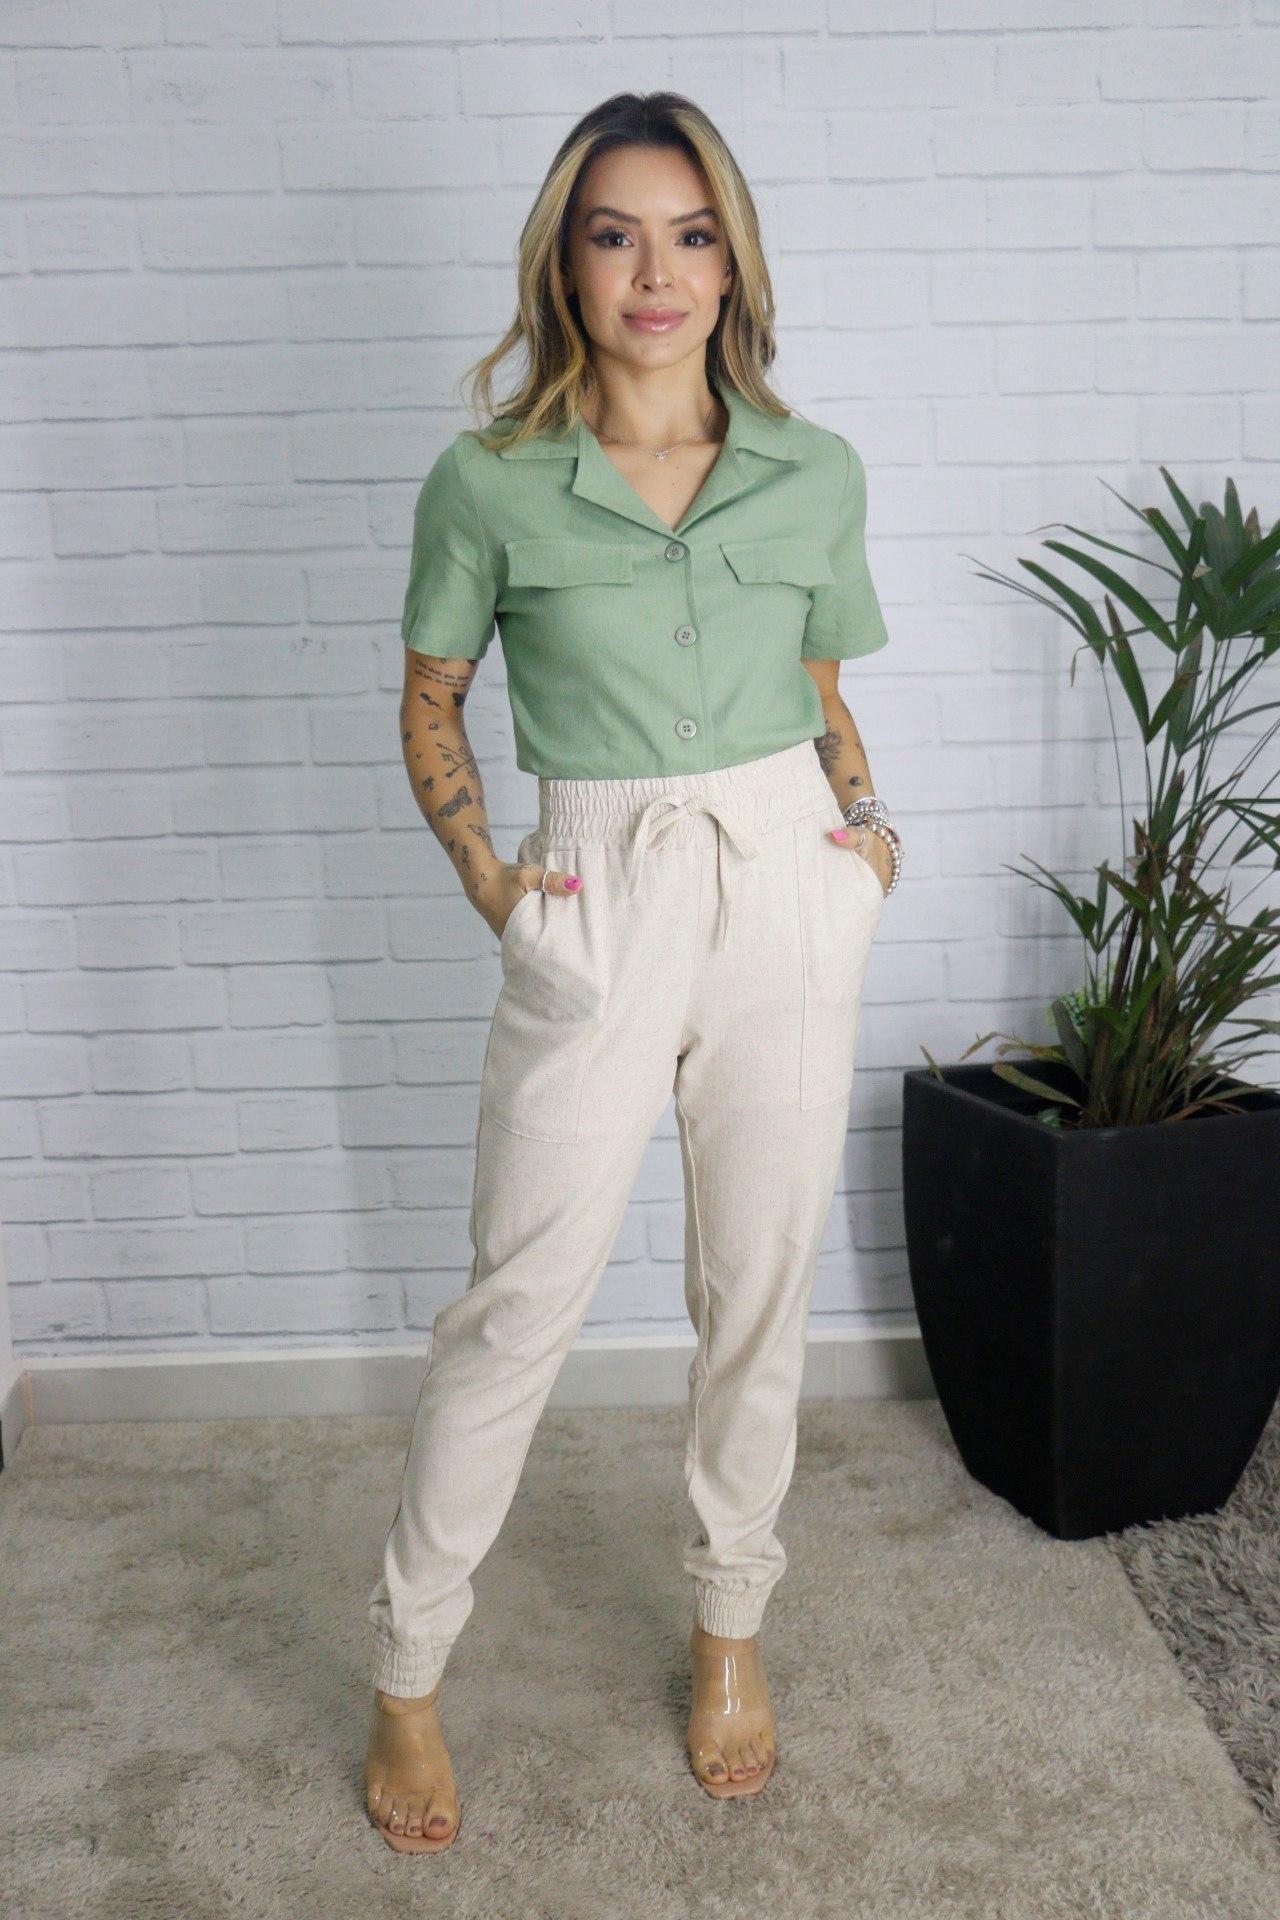 Bella Costa